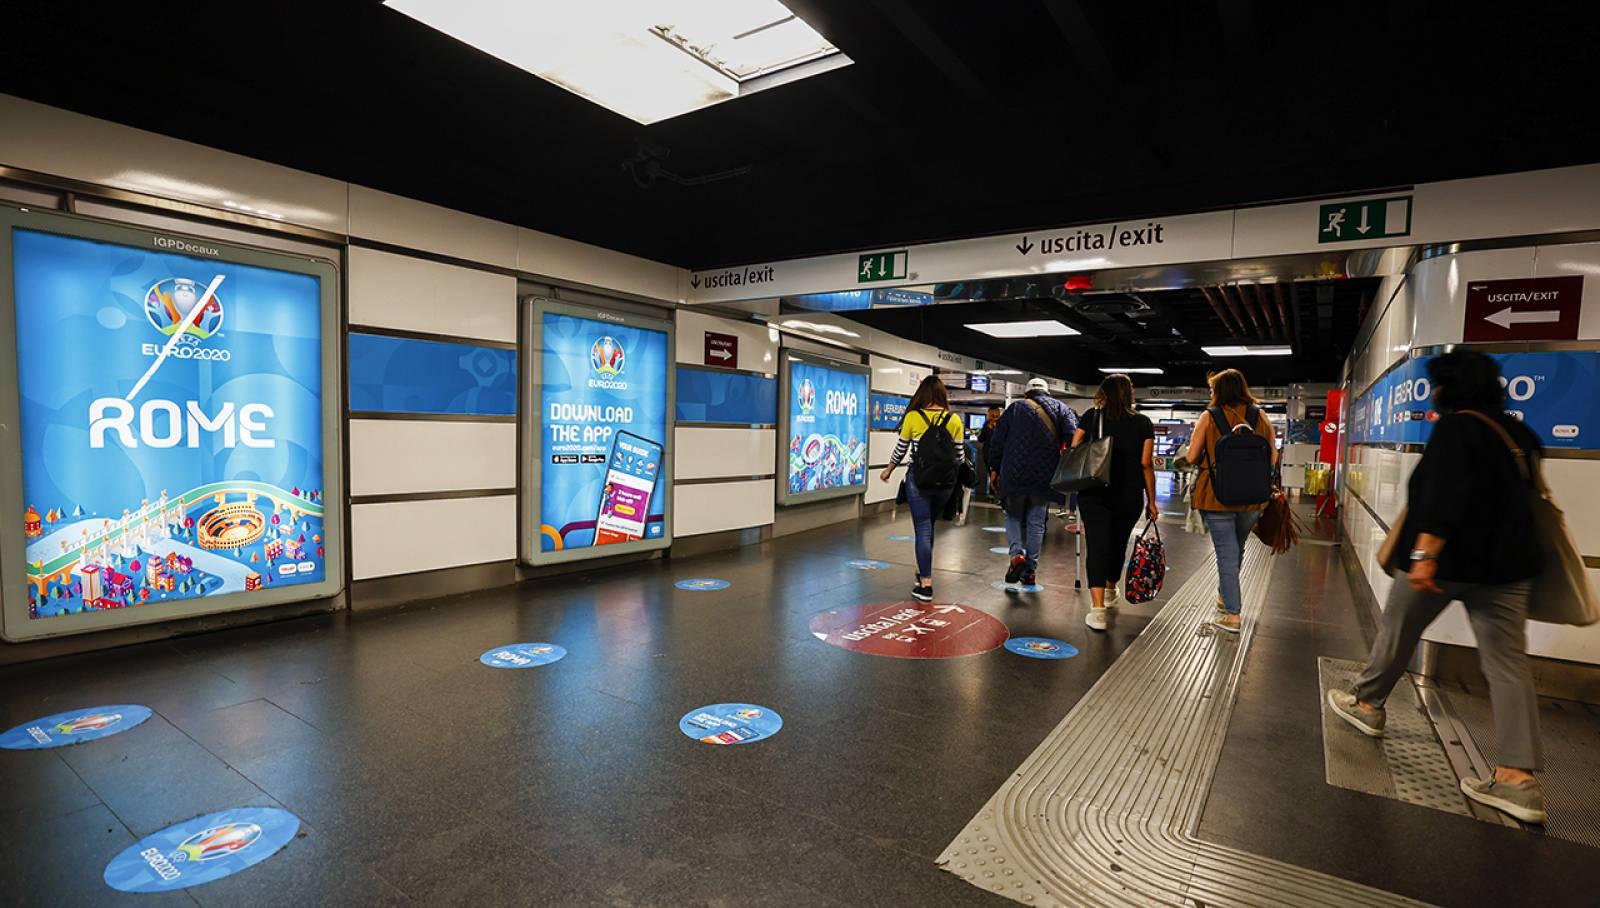 Pubblicità in metropolitana a Roma Termini Station Domination IGPDecaux per UEFA 2020